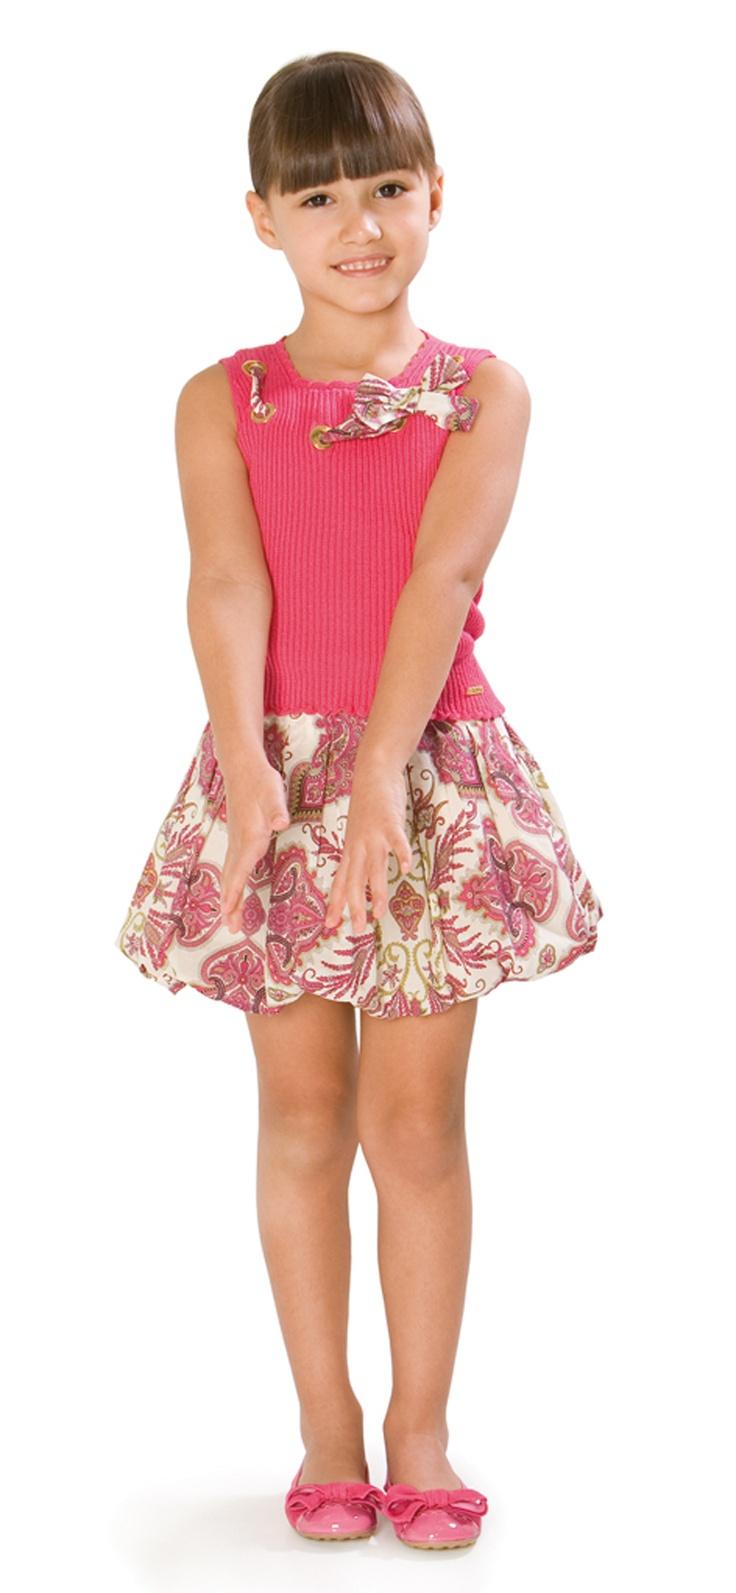 Love this look!    Girl top & skirt -  Pili Carrera - USA - Girl Collections